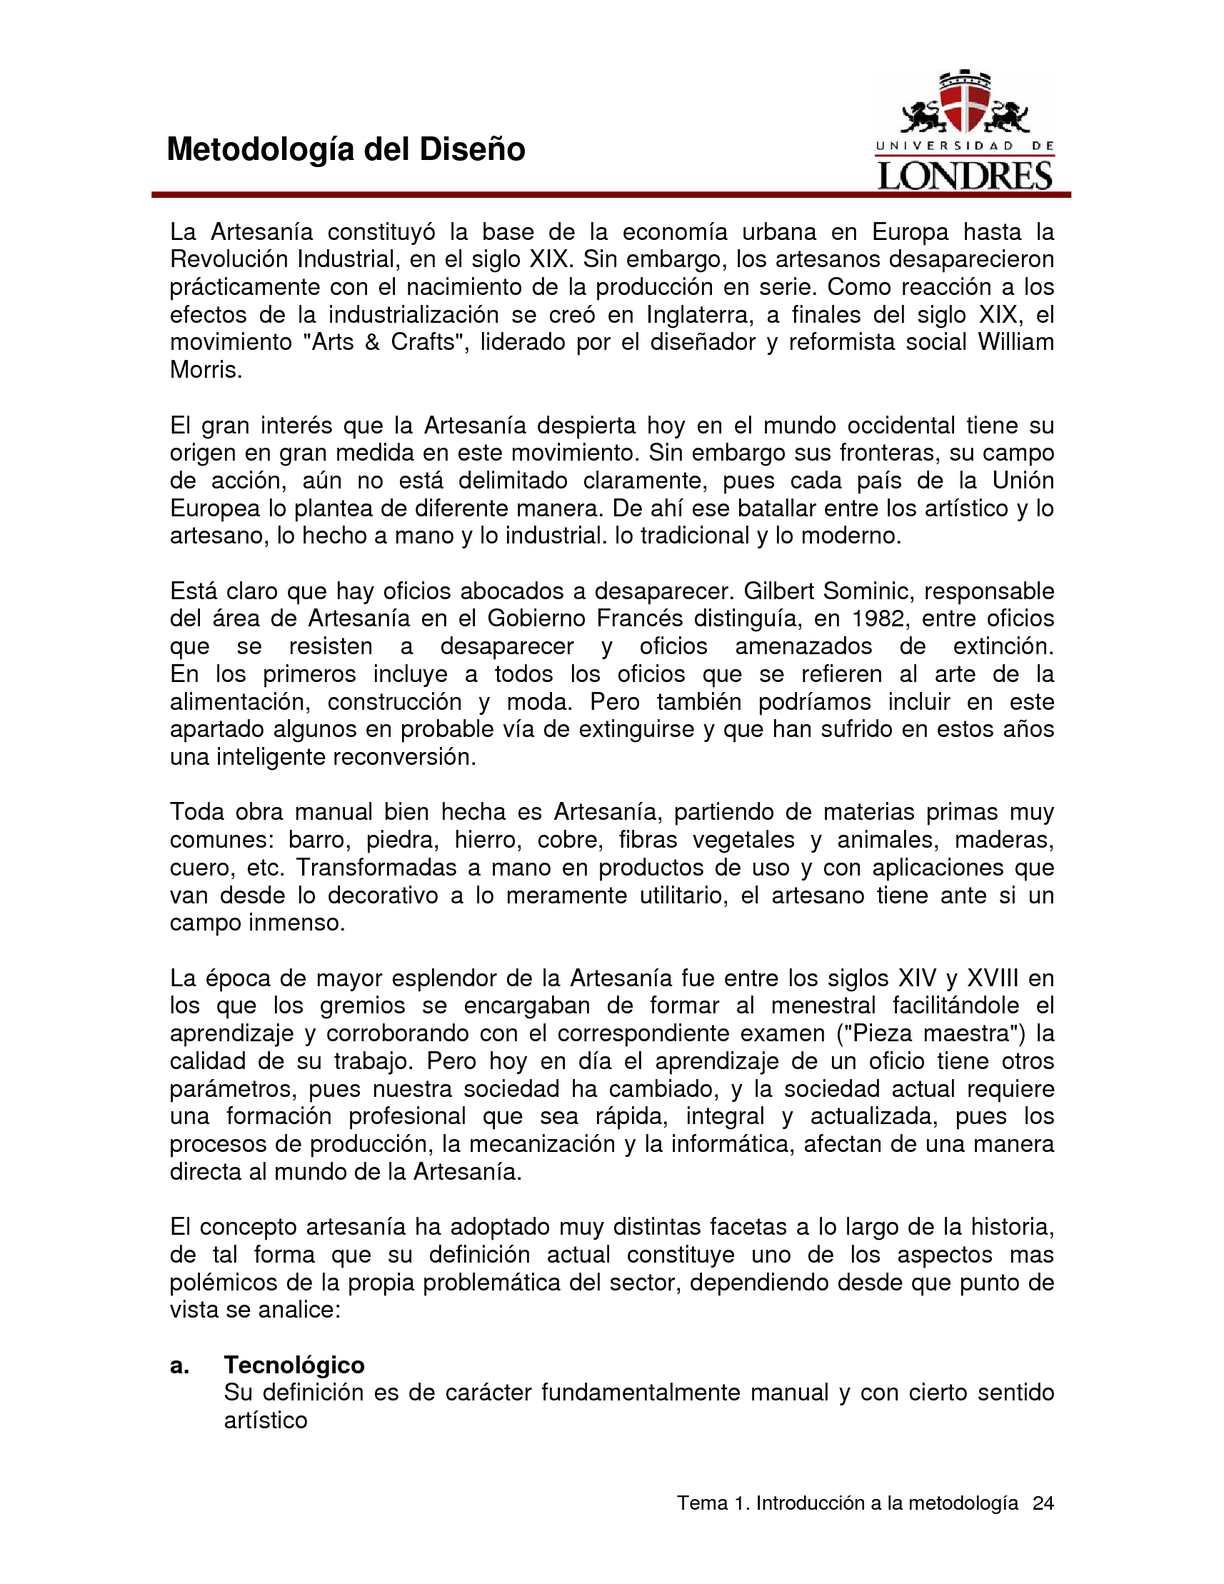 46e5359a3c93 Con Chiusura Ammortizzata Et Loa Calaméo - Querciacb